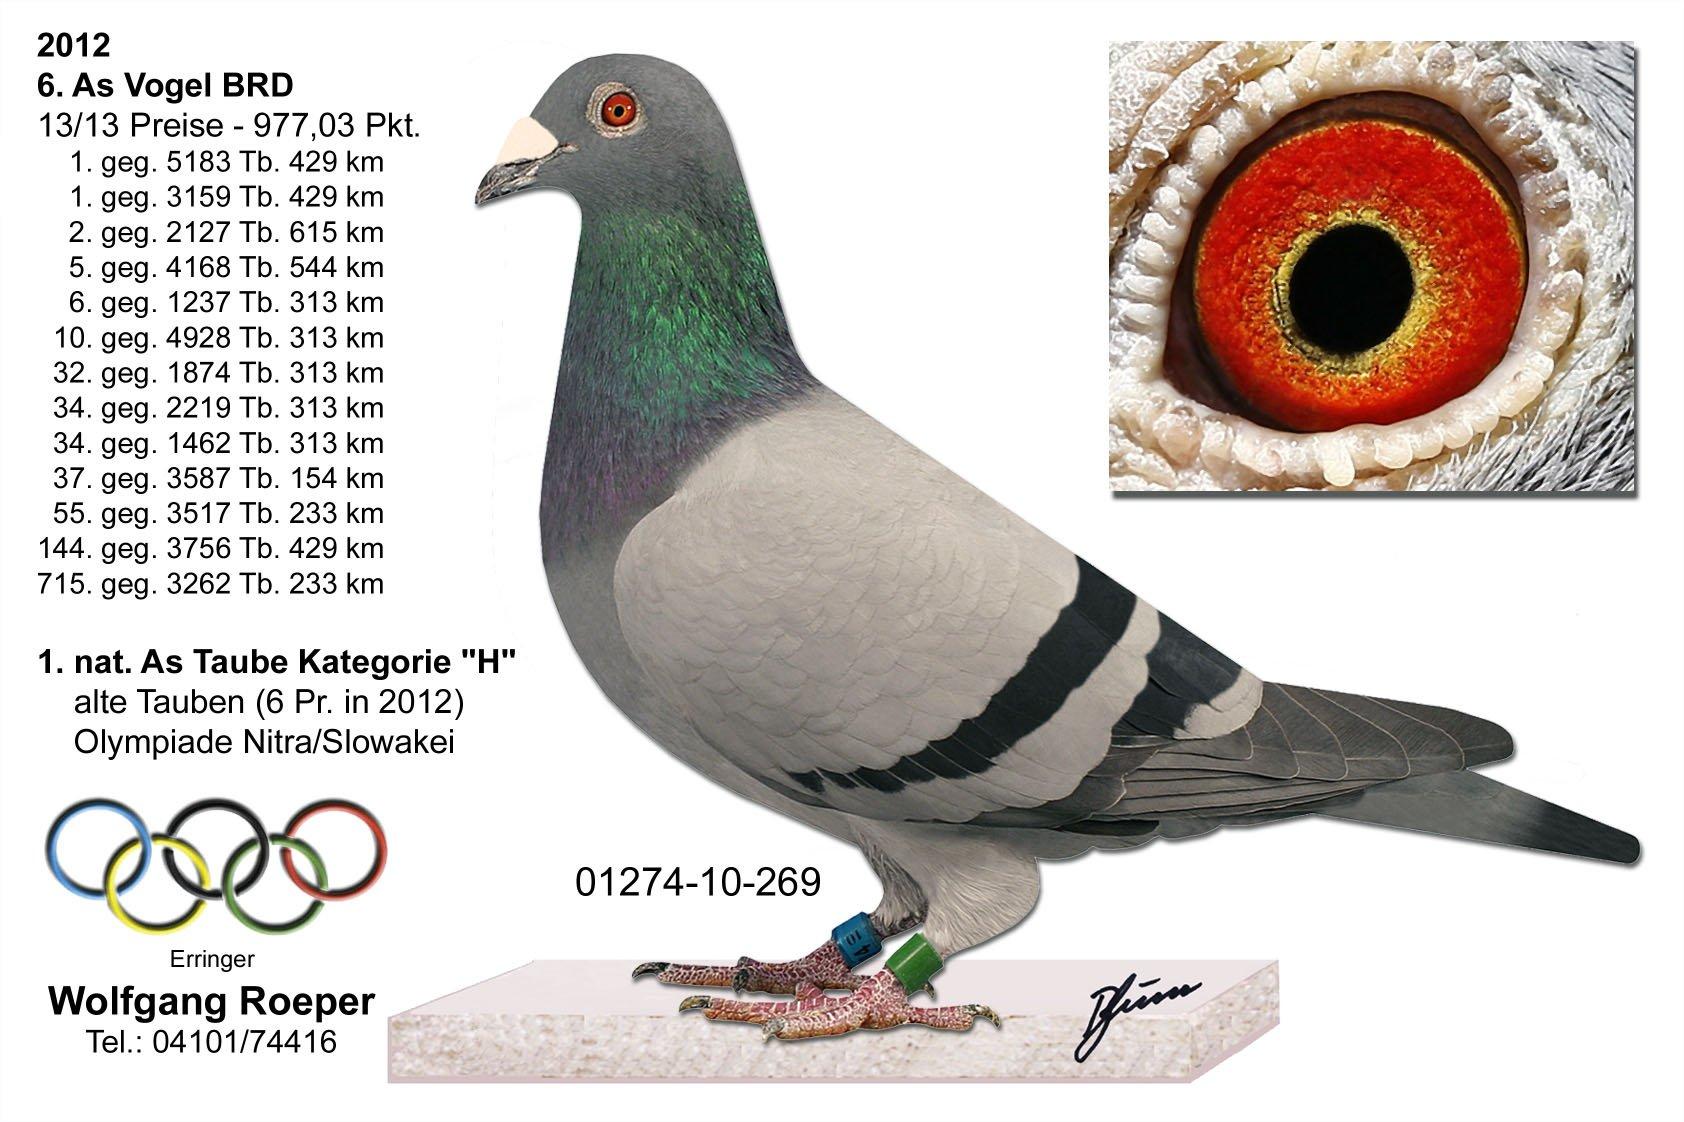 Racing pigeons breeding methods - photo#3